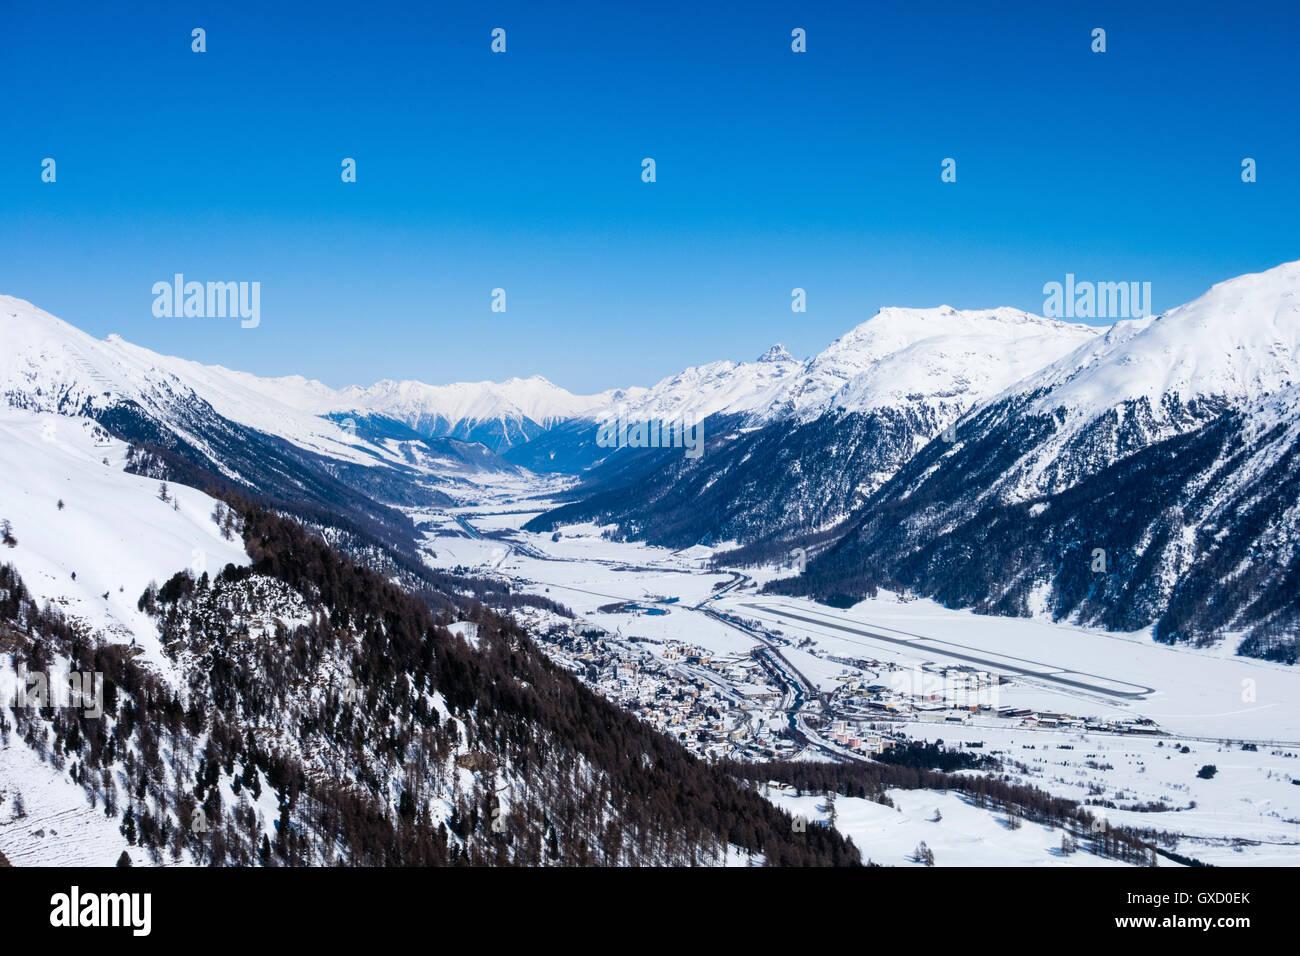 Snow covered mountain valley, Engadin, Switzerland - Stock Image